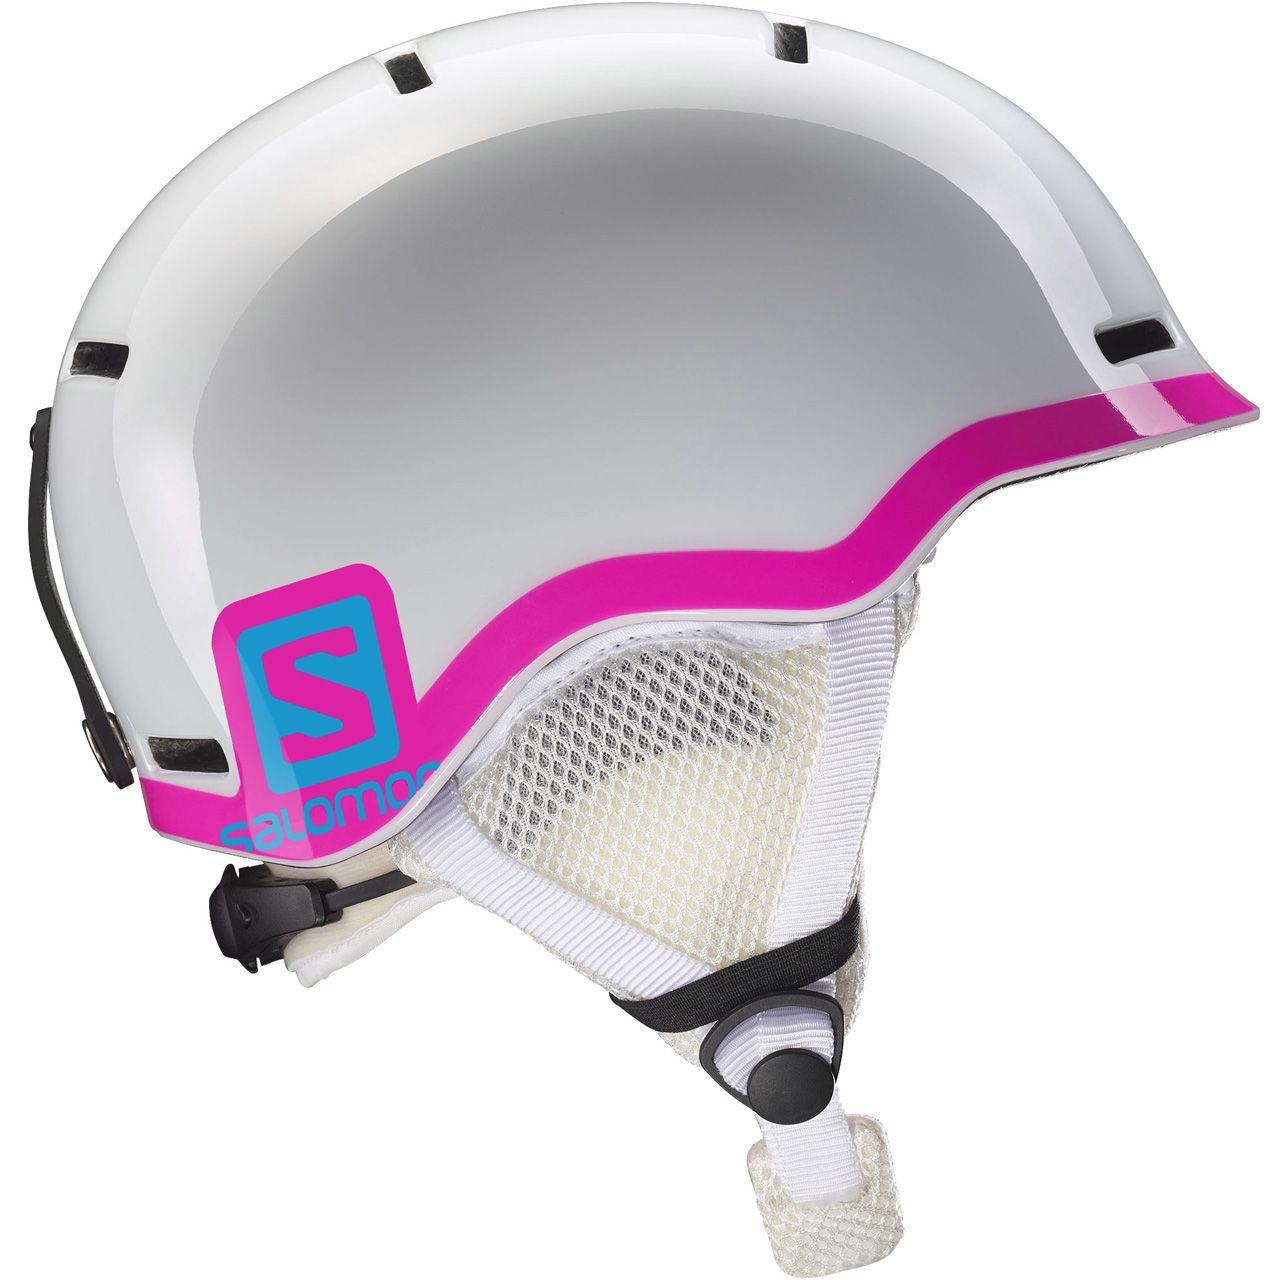 Salomon Grom white glossy / pink (2018/19) - M ...